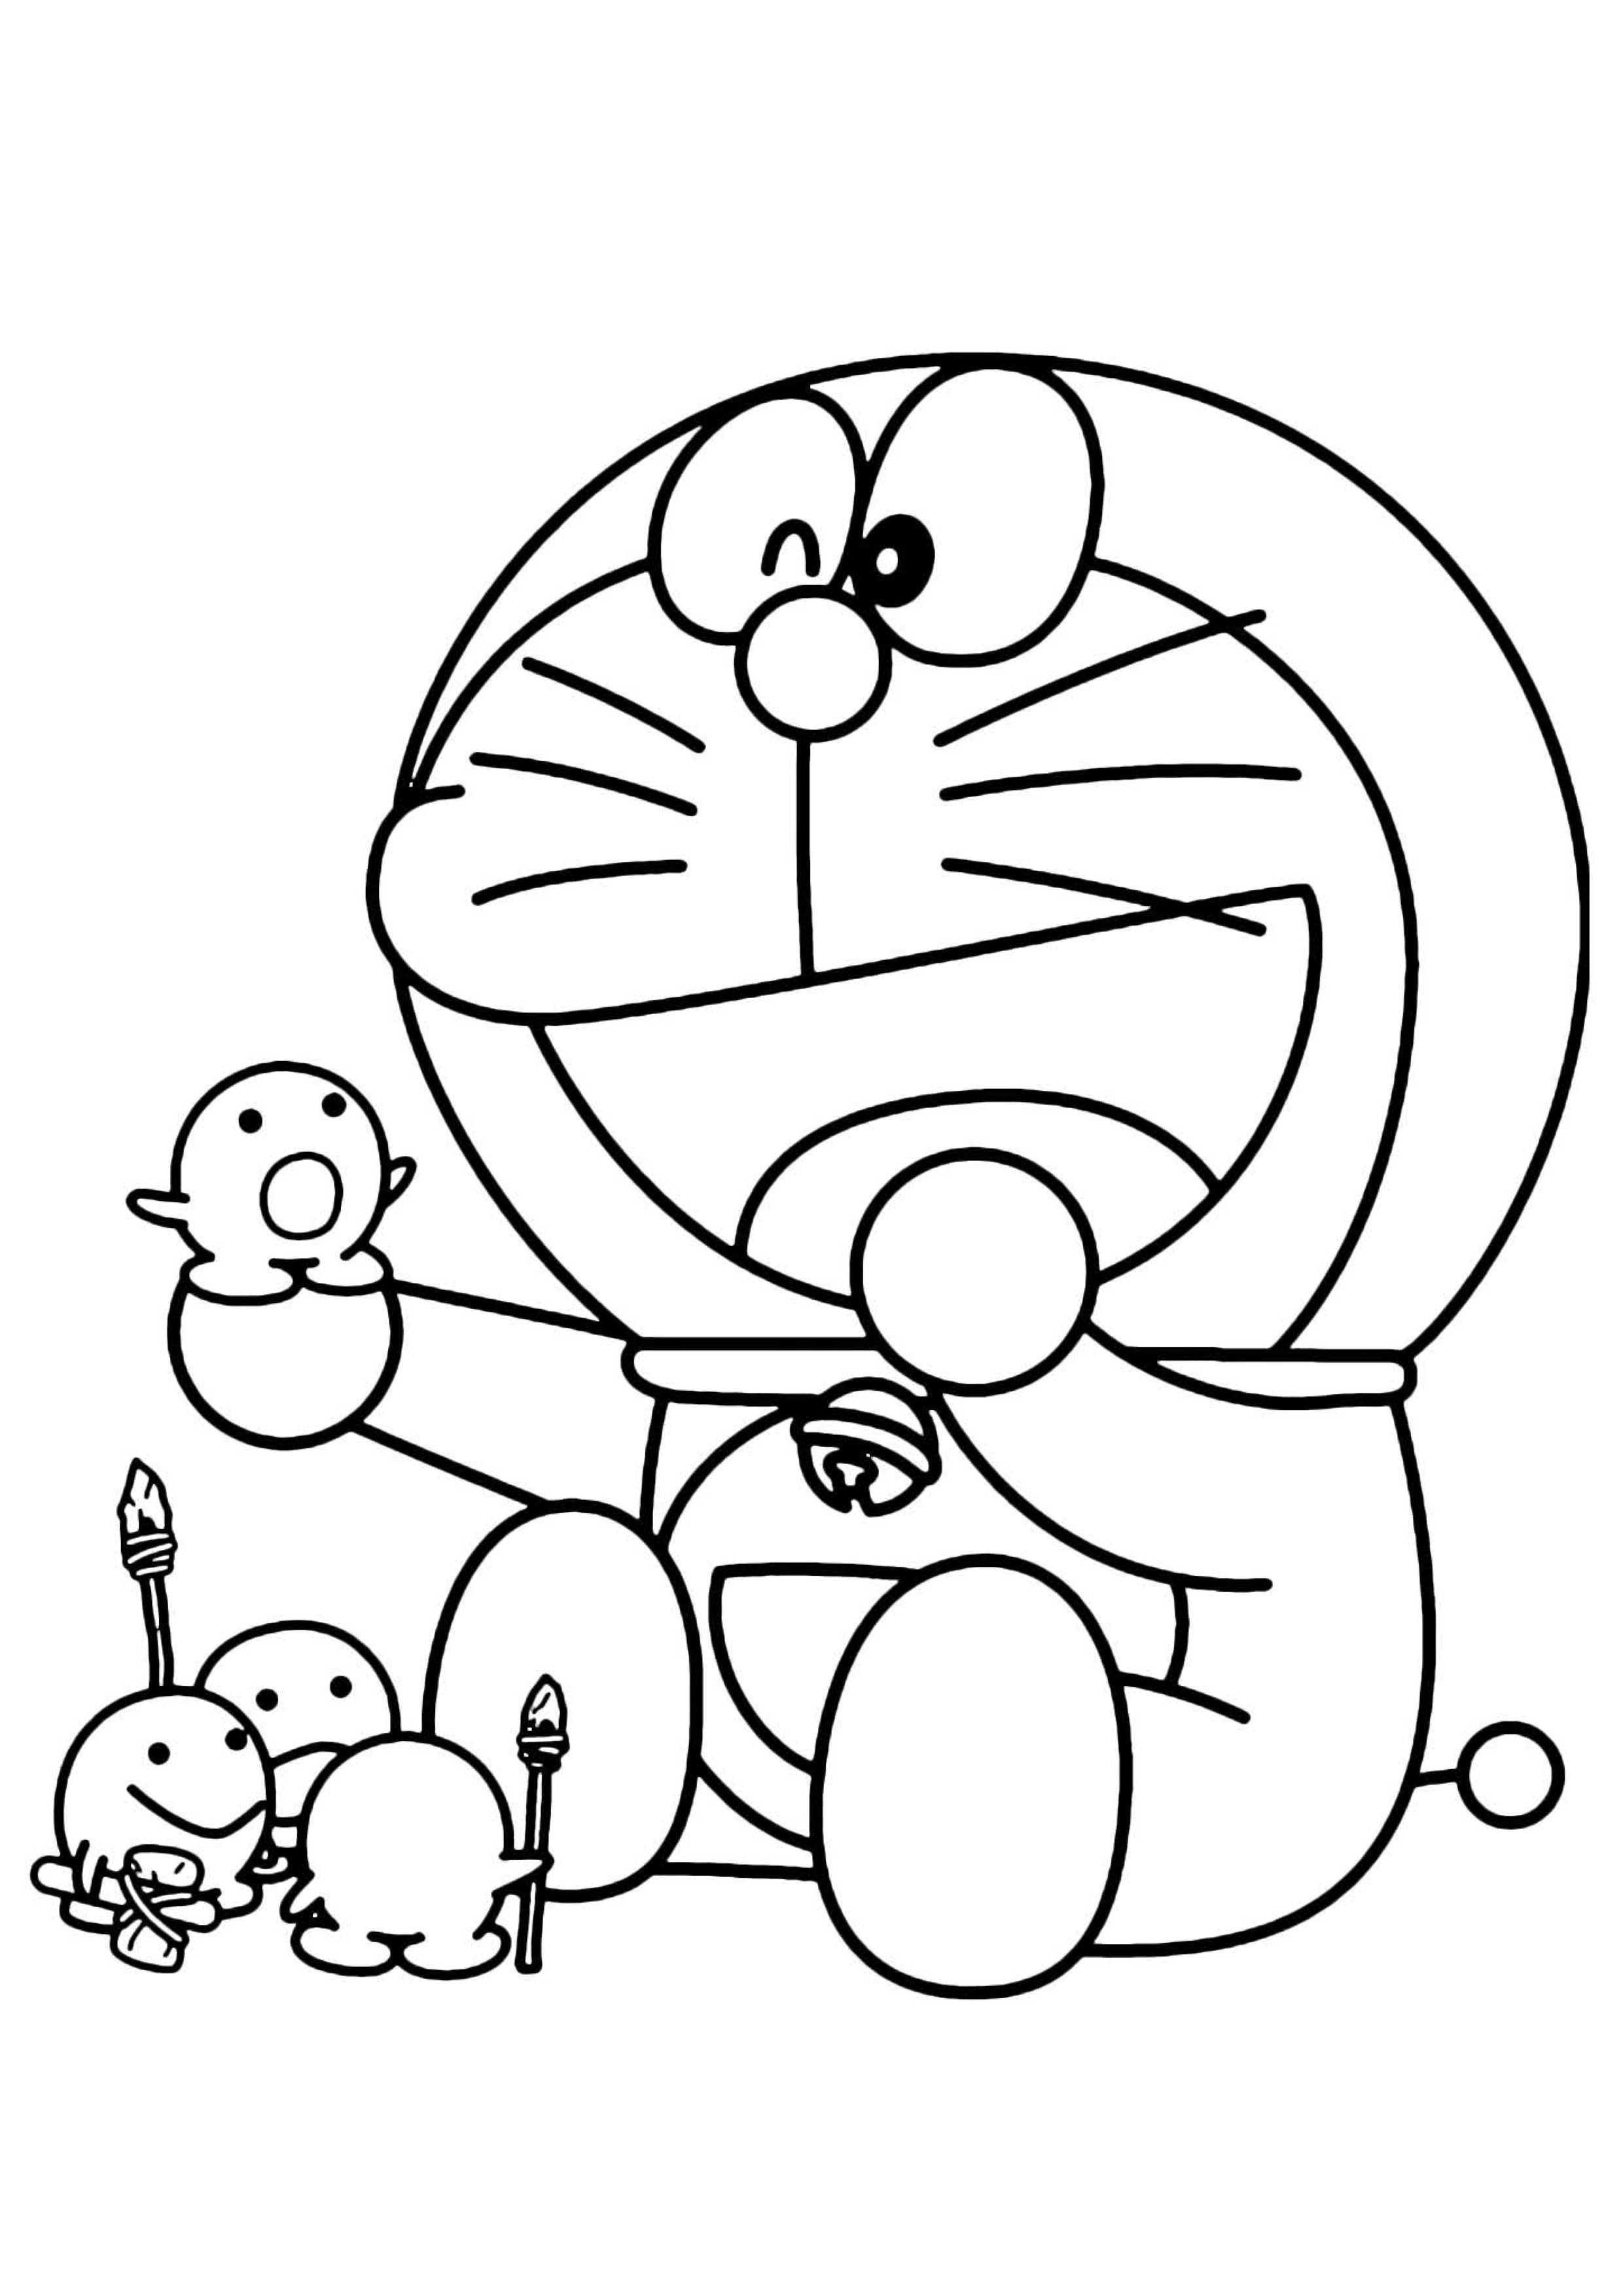 Doraemon-08